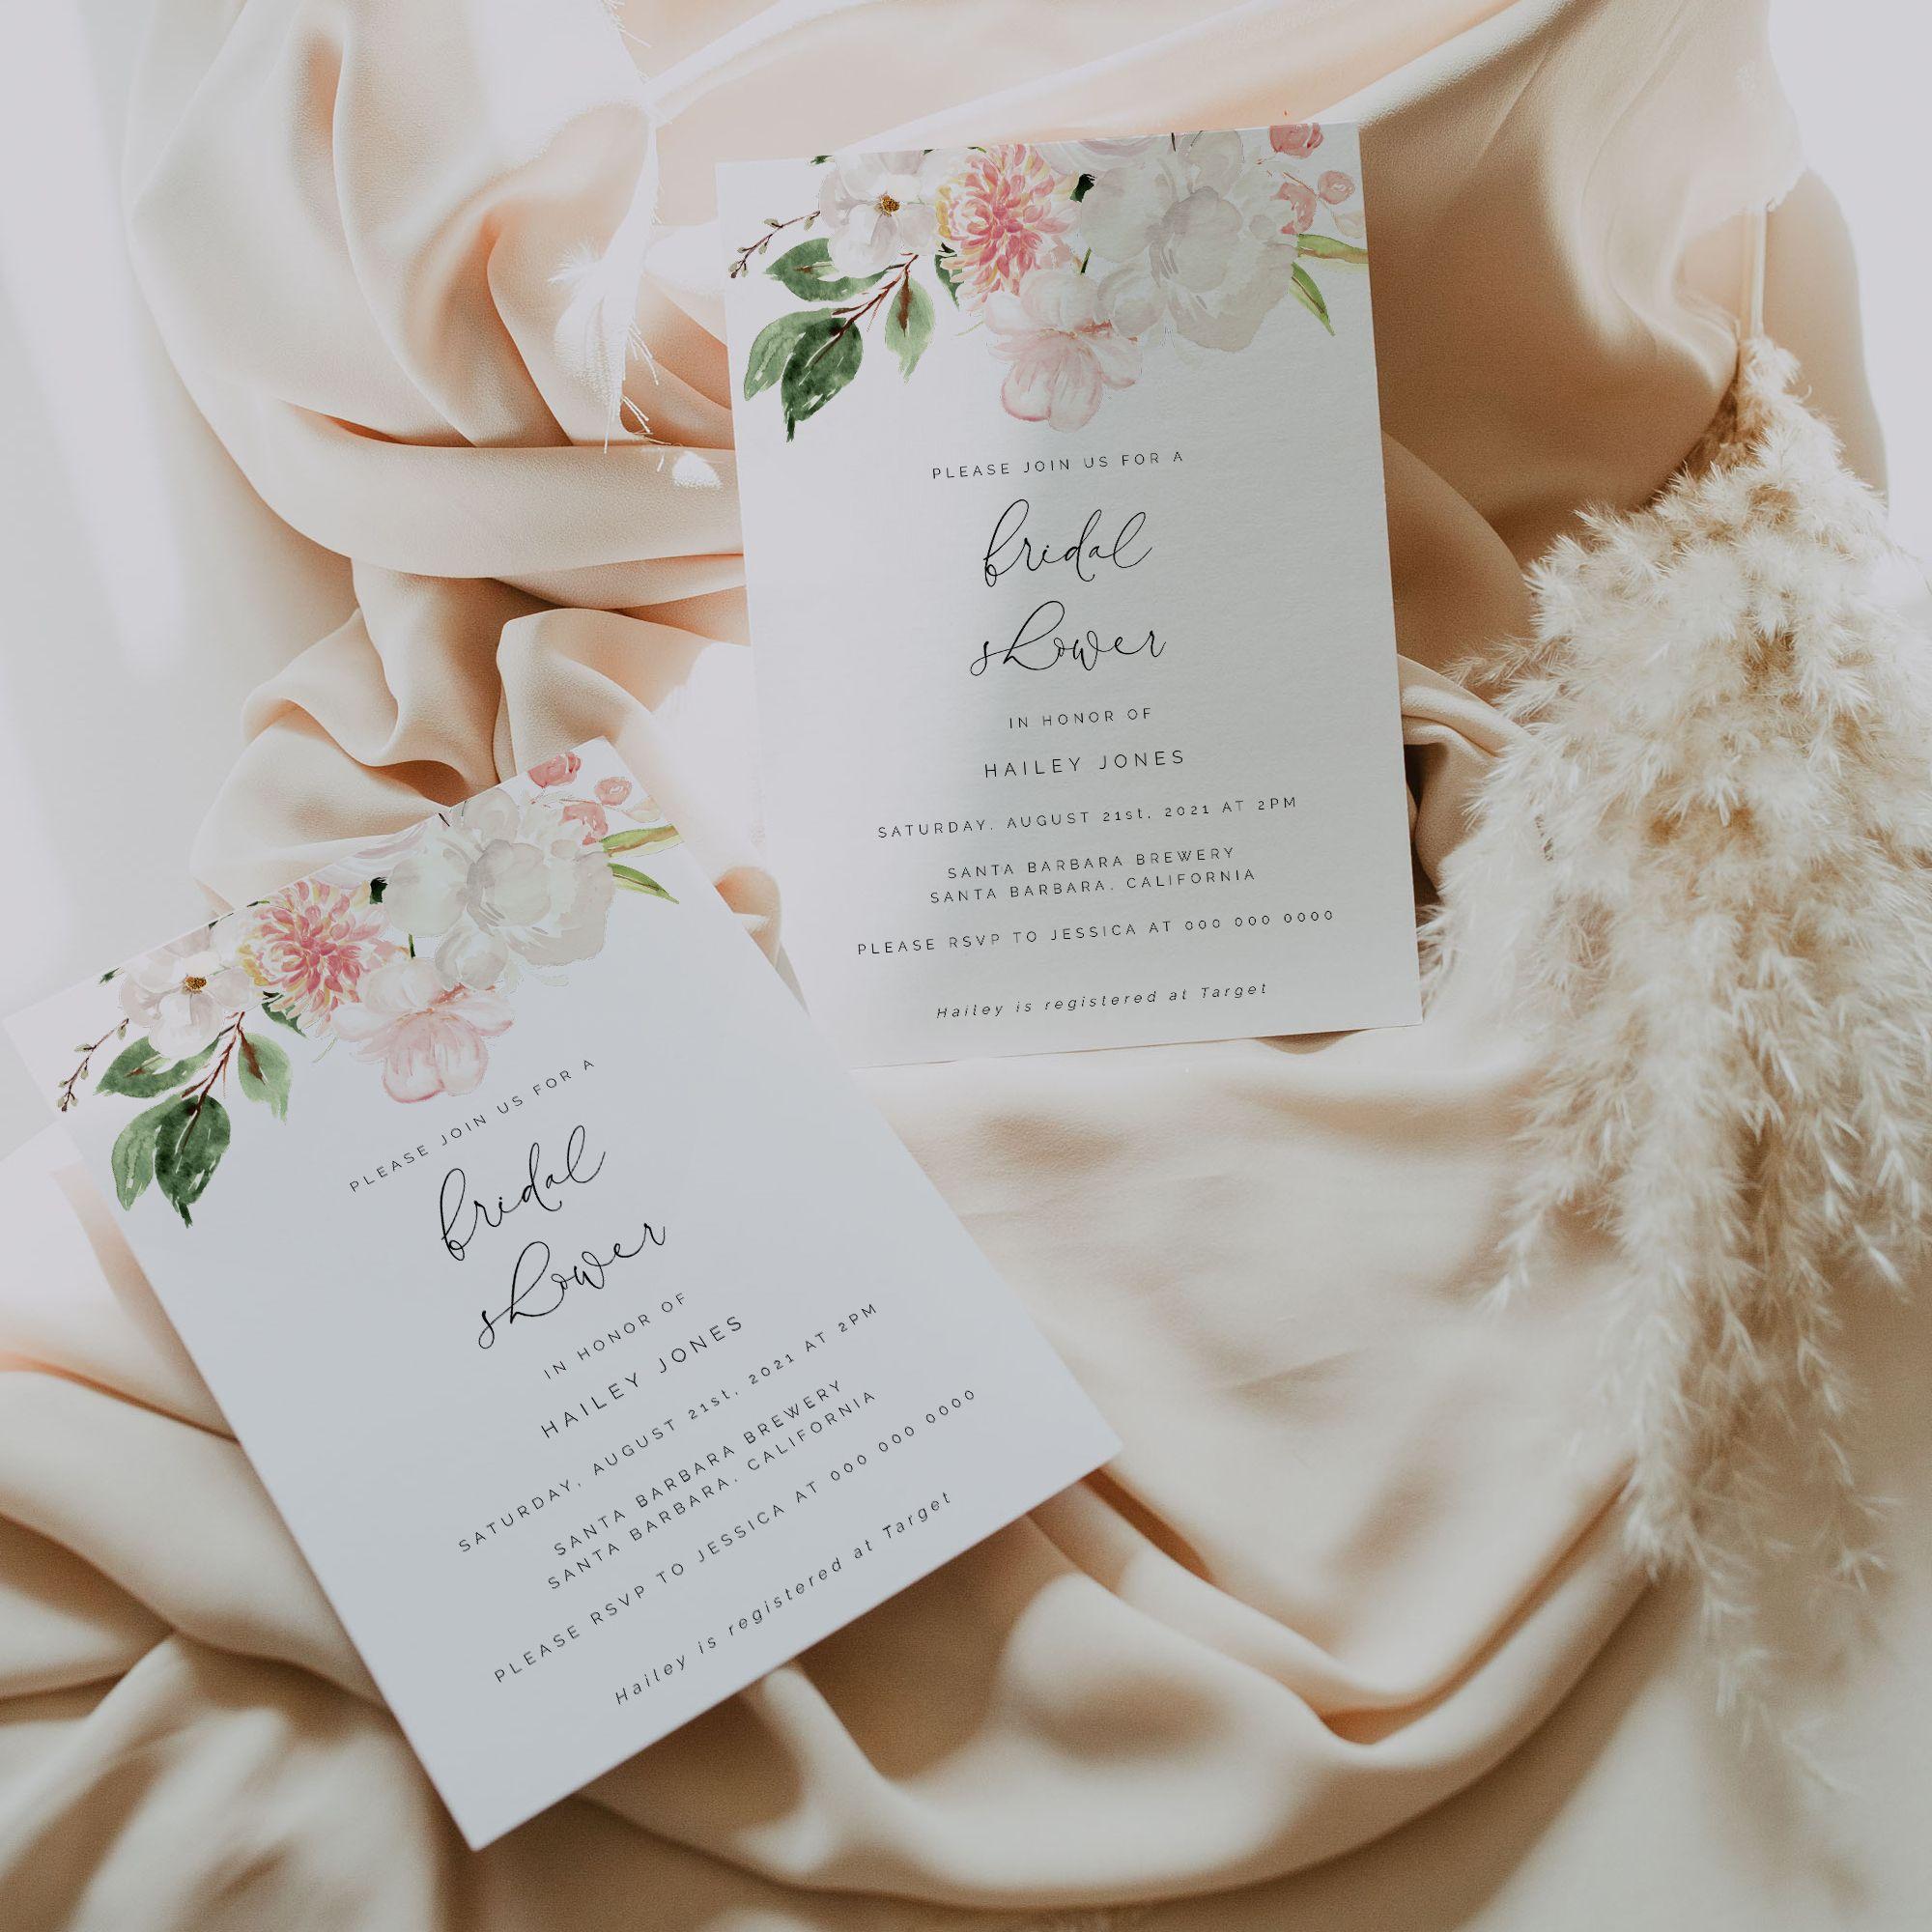 Blush Florals Bridal Shower Invites.jpg